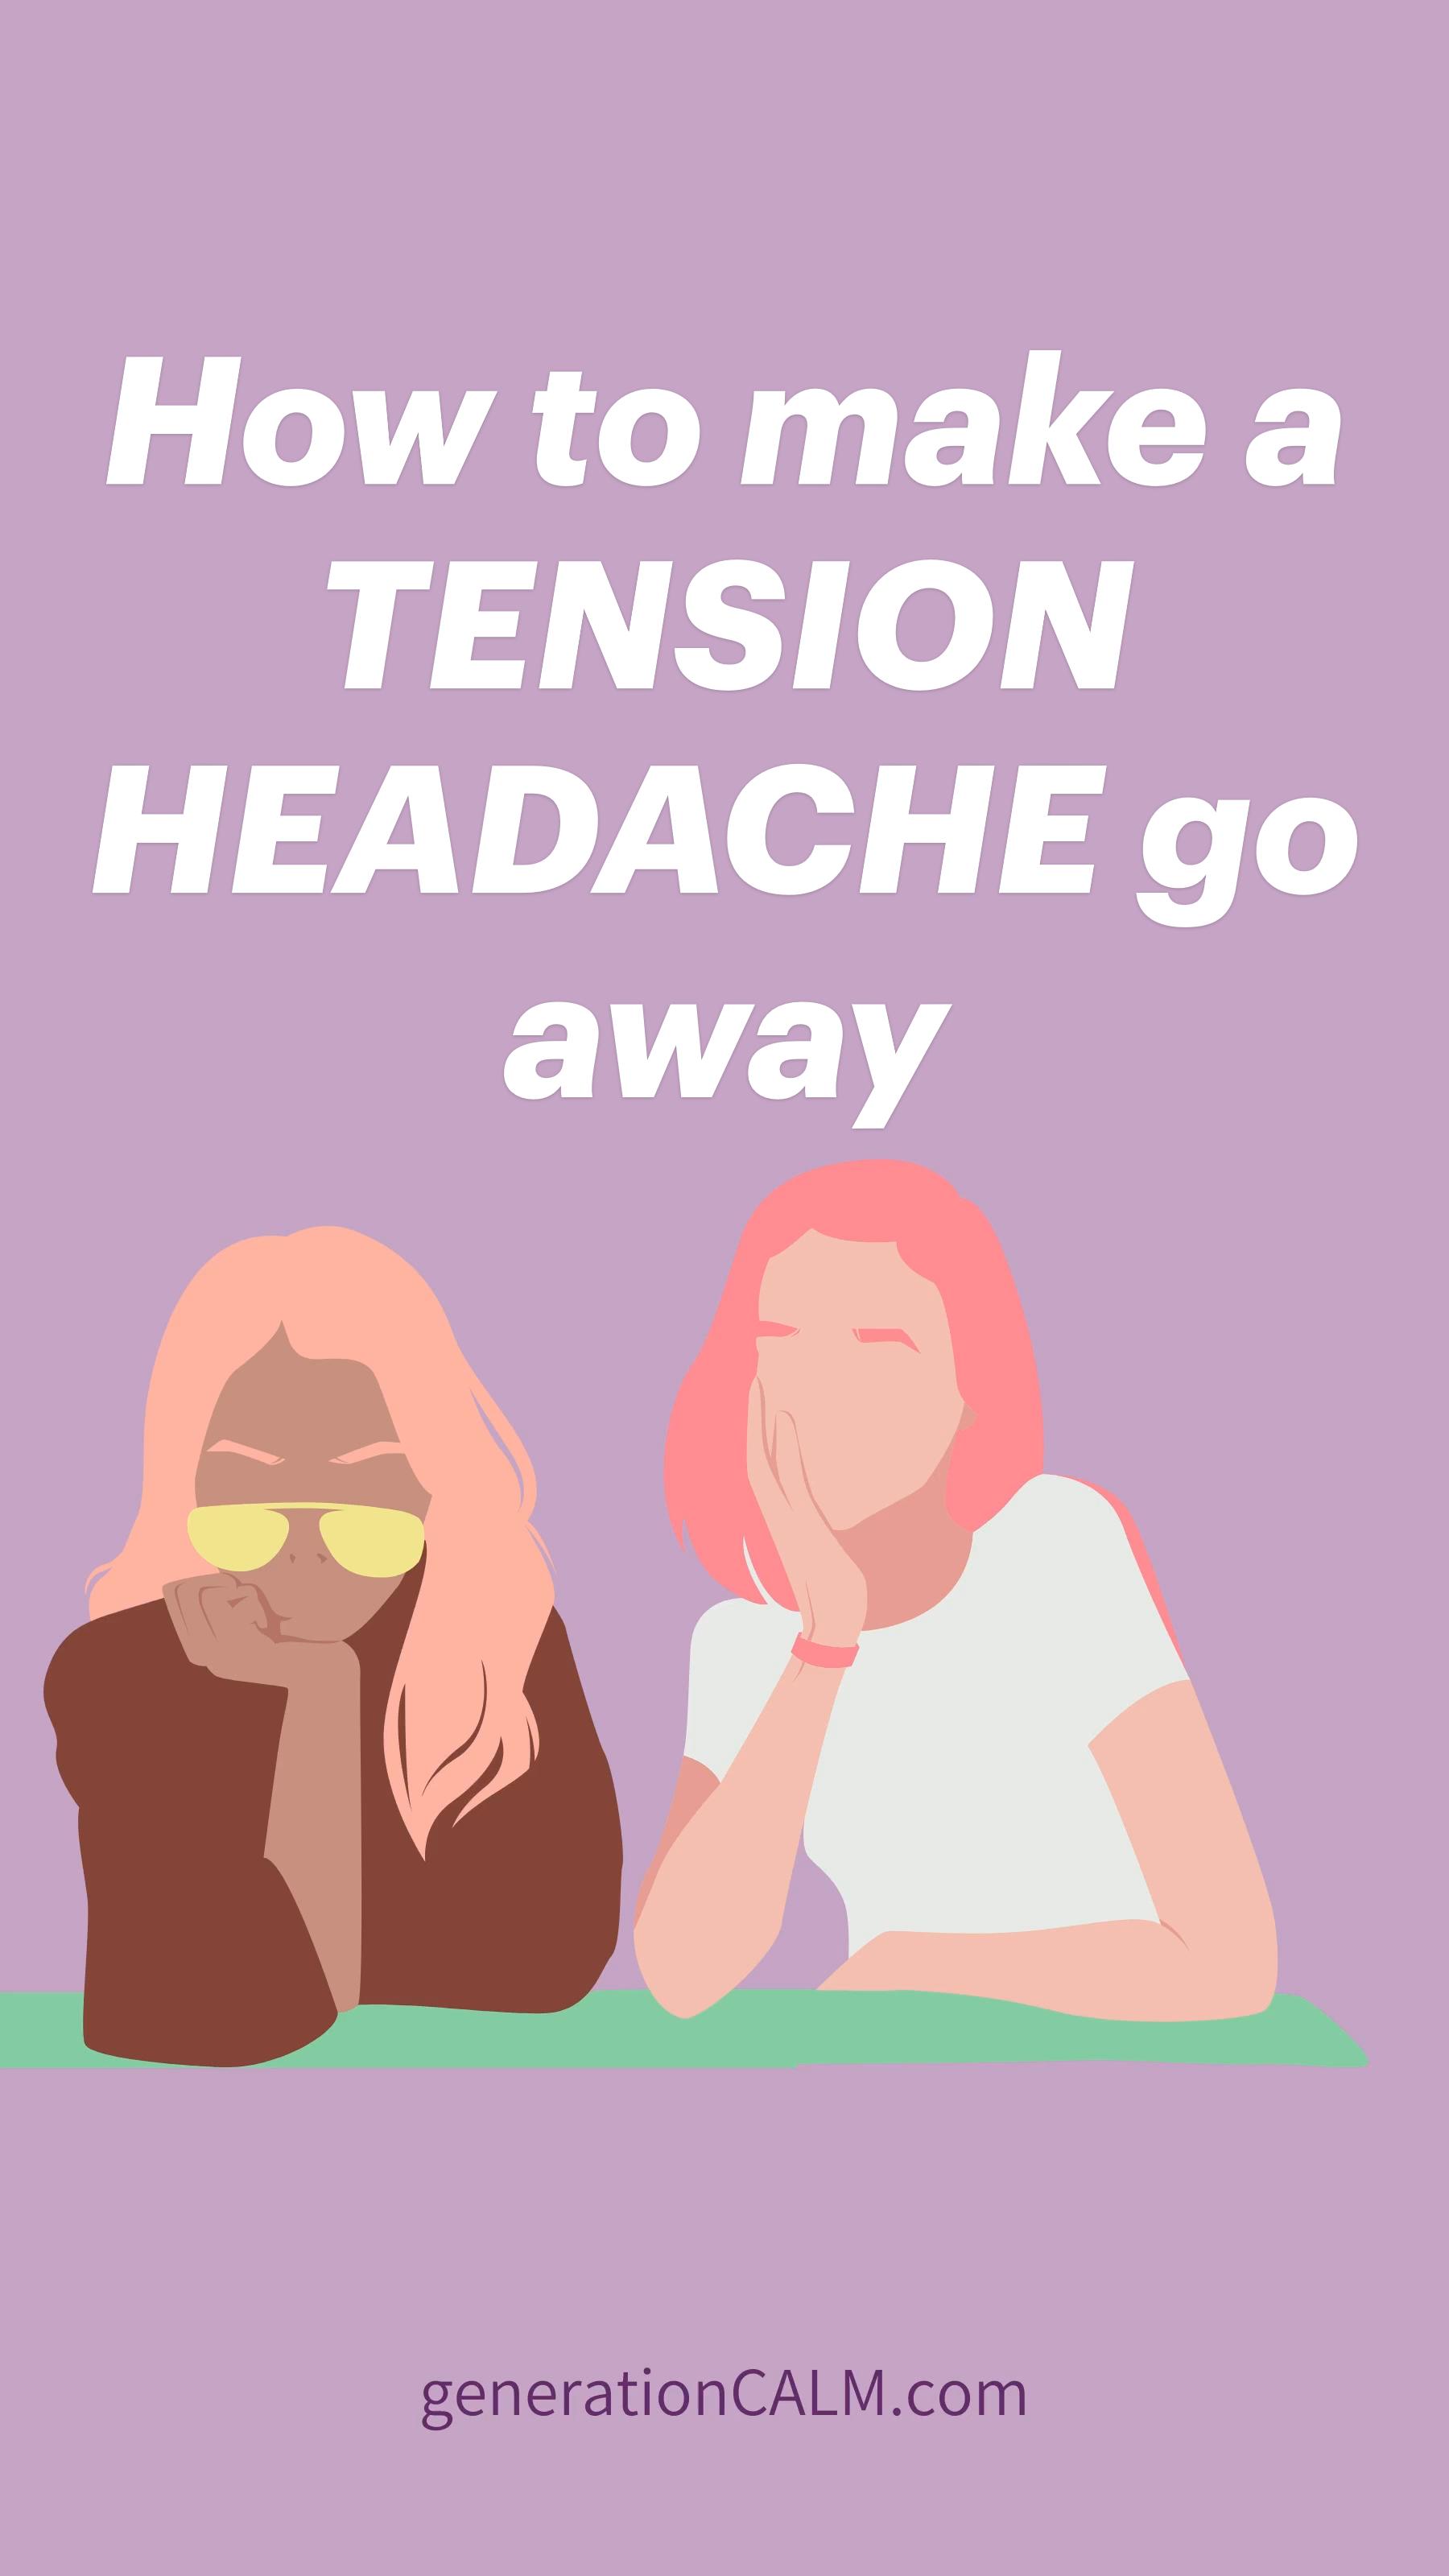 How to make a TENSION HEADACHE go away